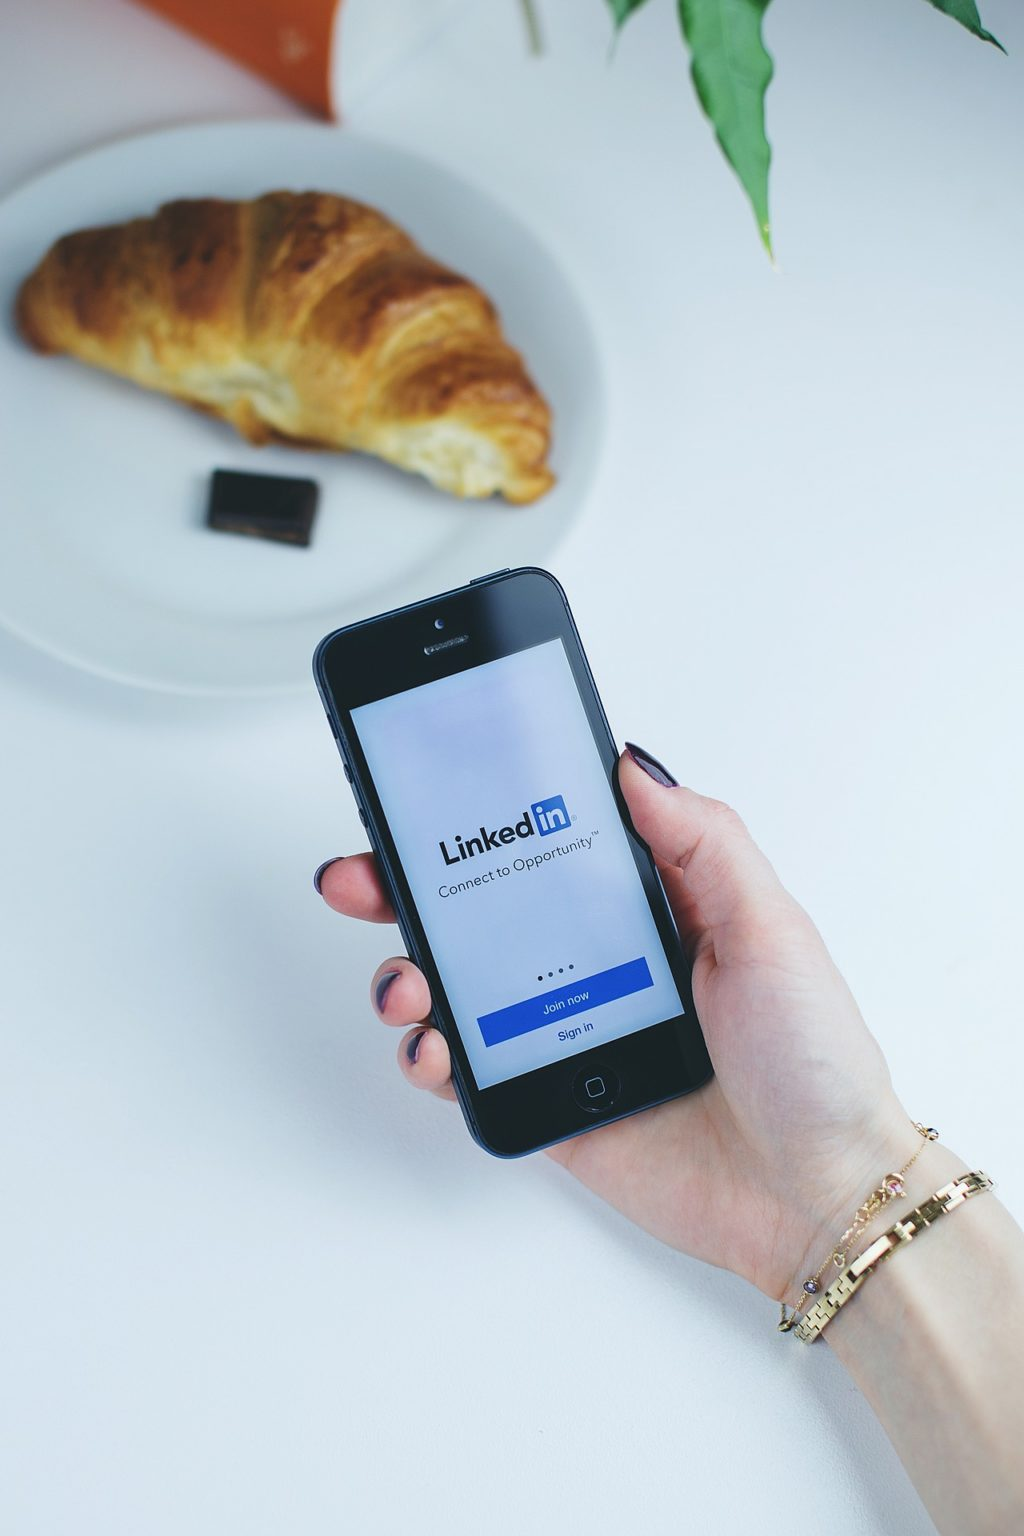 r Tomandl Social Media Marketing